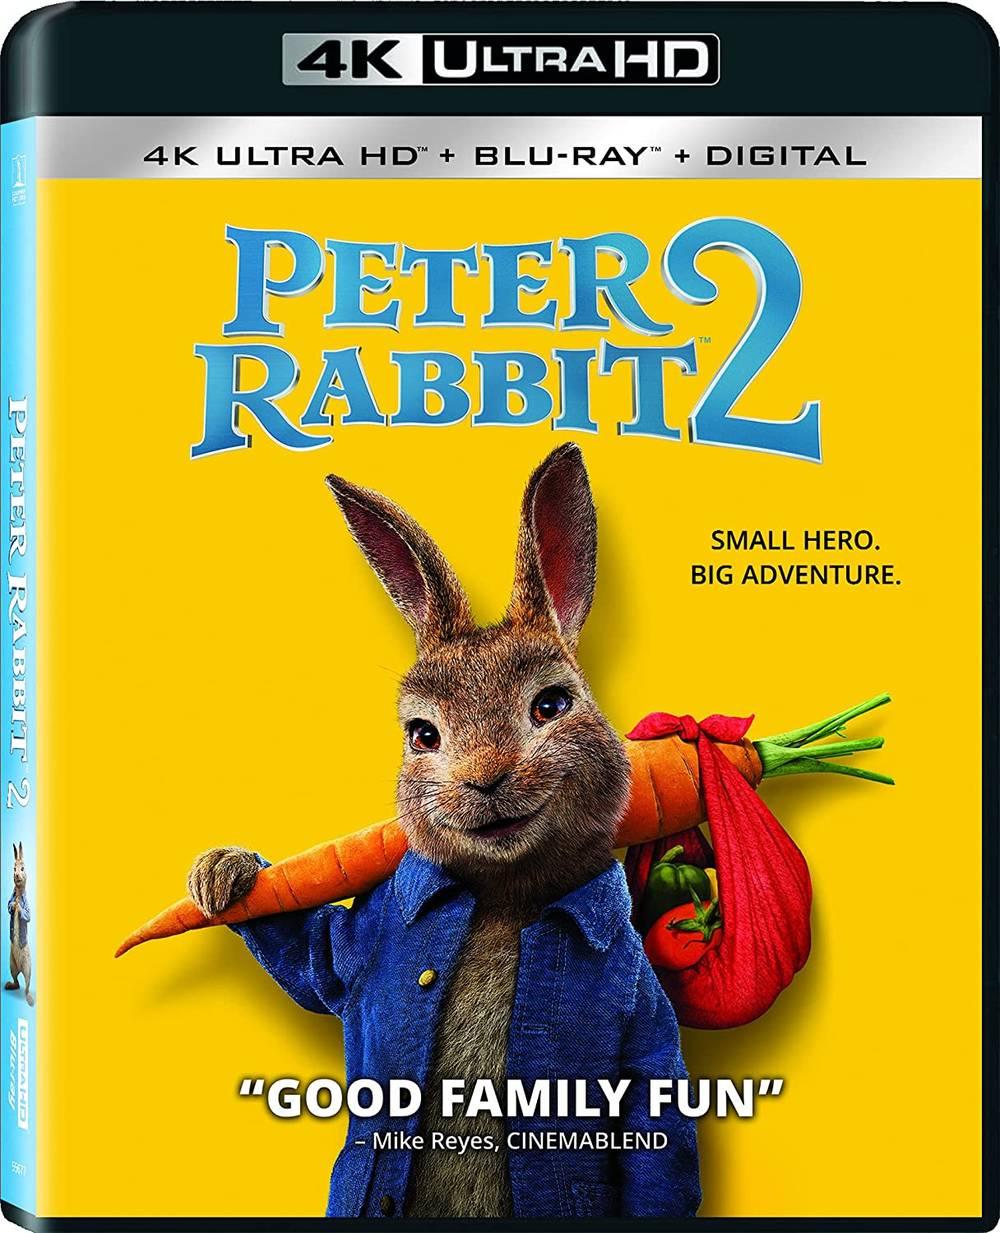 Peter Rabbit [Movie] - Peter Rabbit 2 [4K]